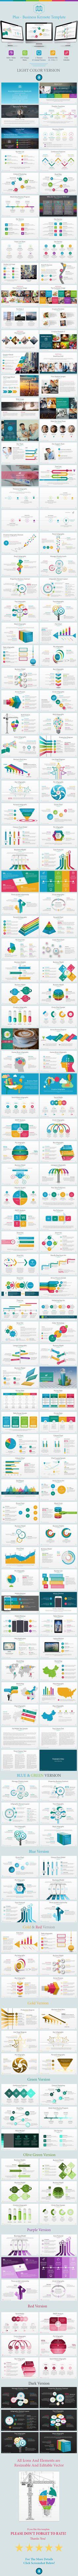 Plus - Business Keynote Template #design #slides Download: http://graphicriver.net/item/plus-business-keynote-template/12497760?ref=ksioks